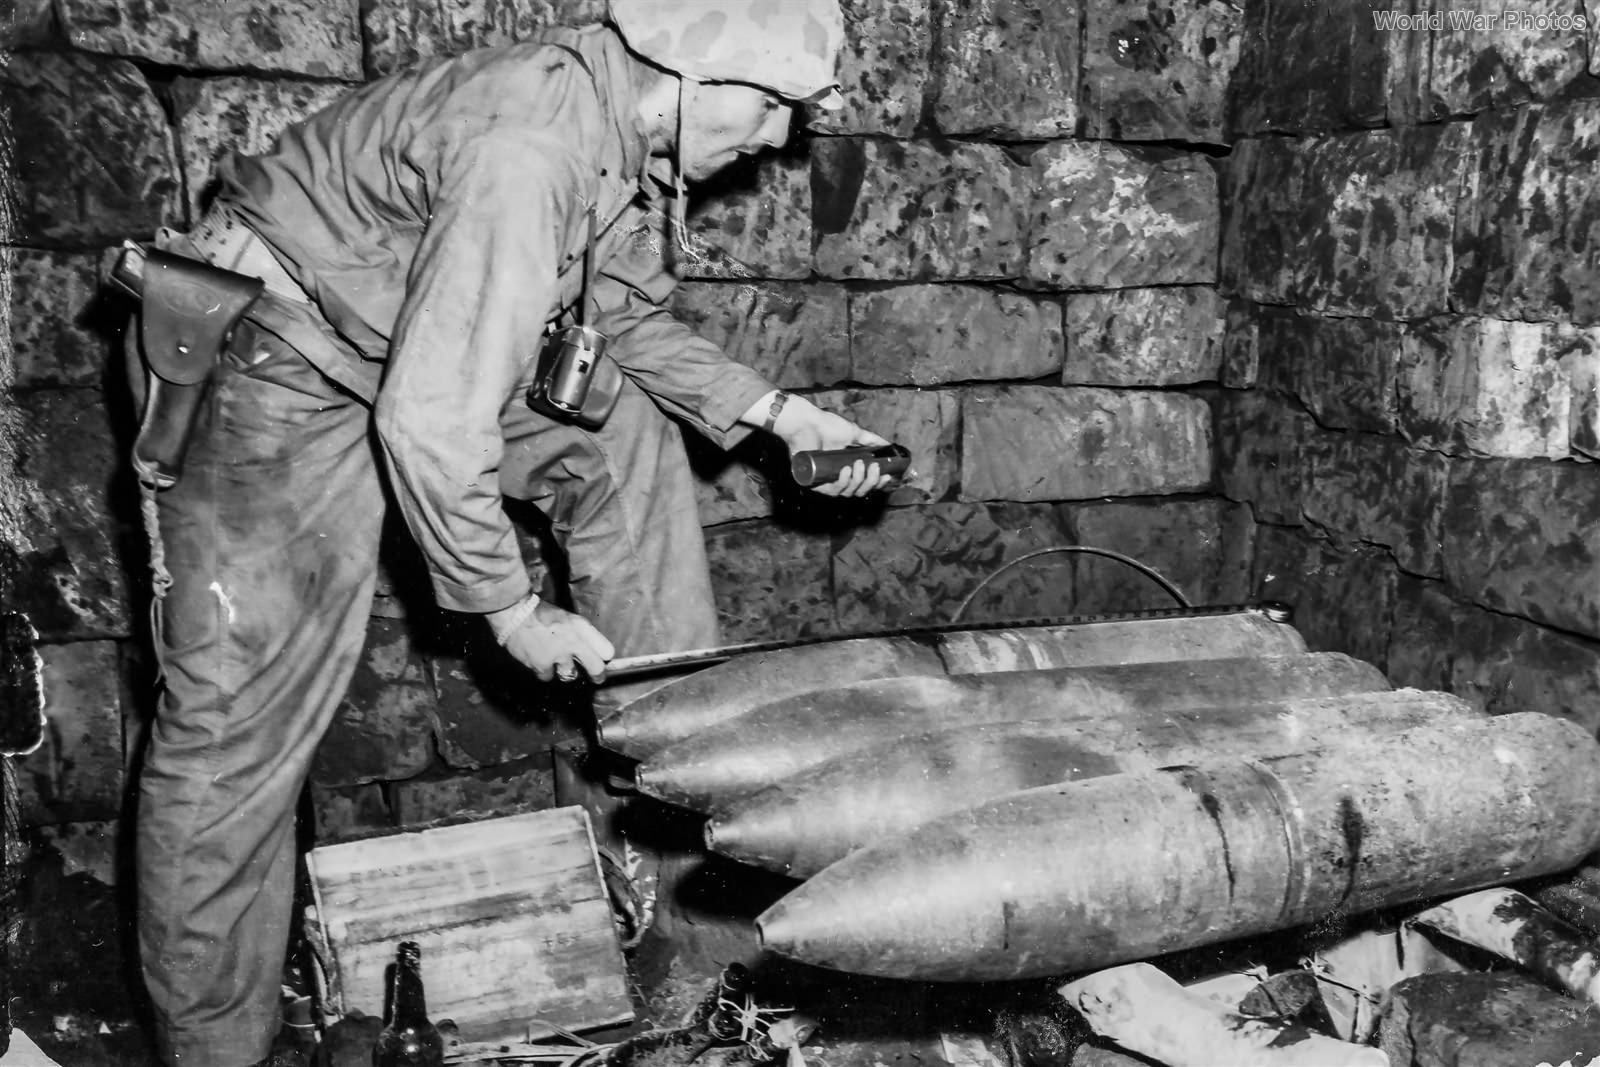 Japanese 200mm rockets found in bunker on Iwo Jima Mach 1945